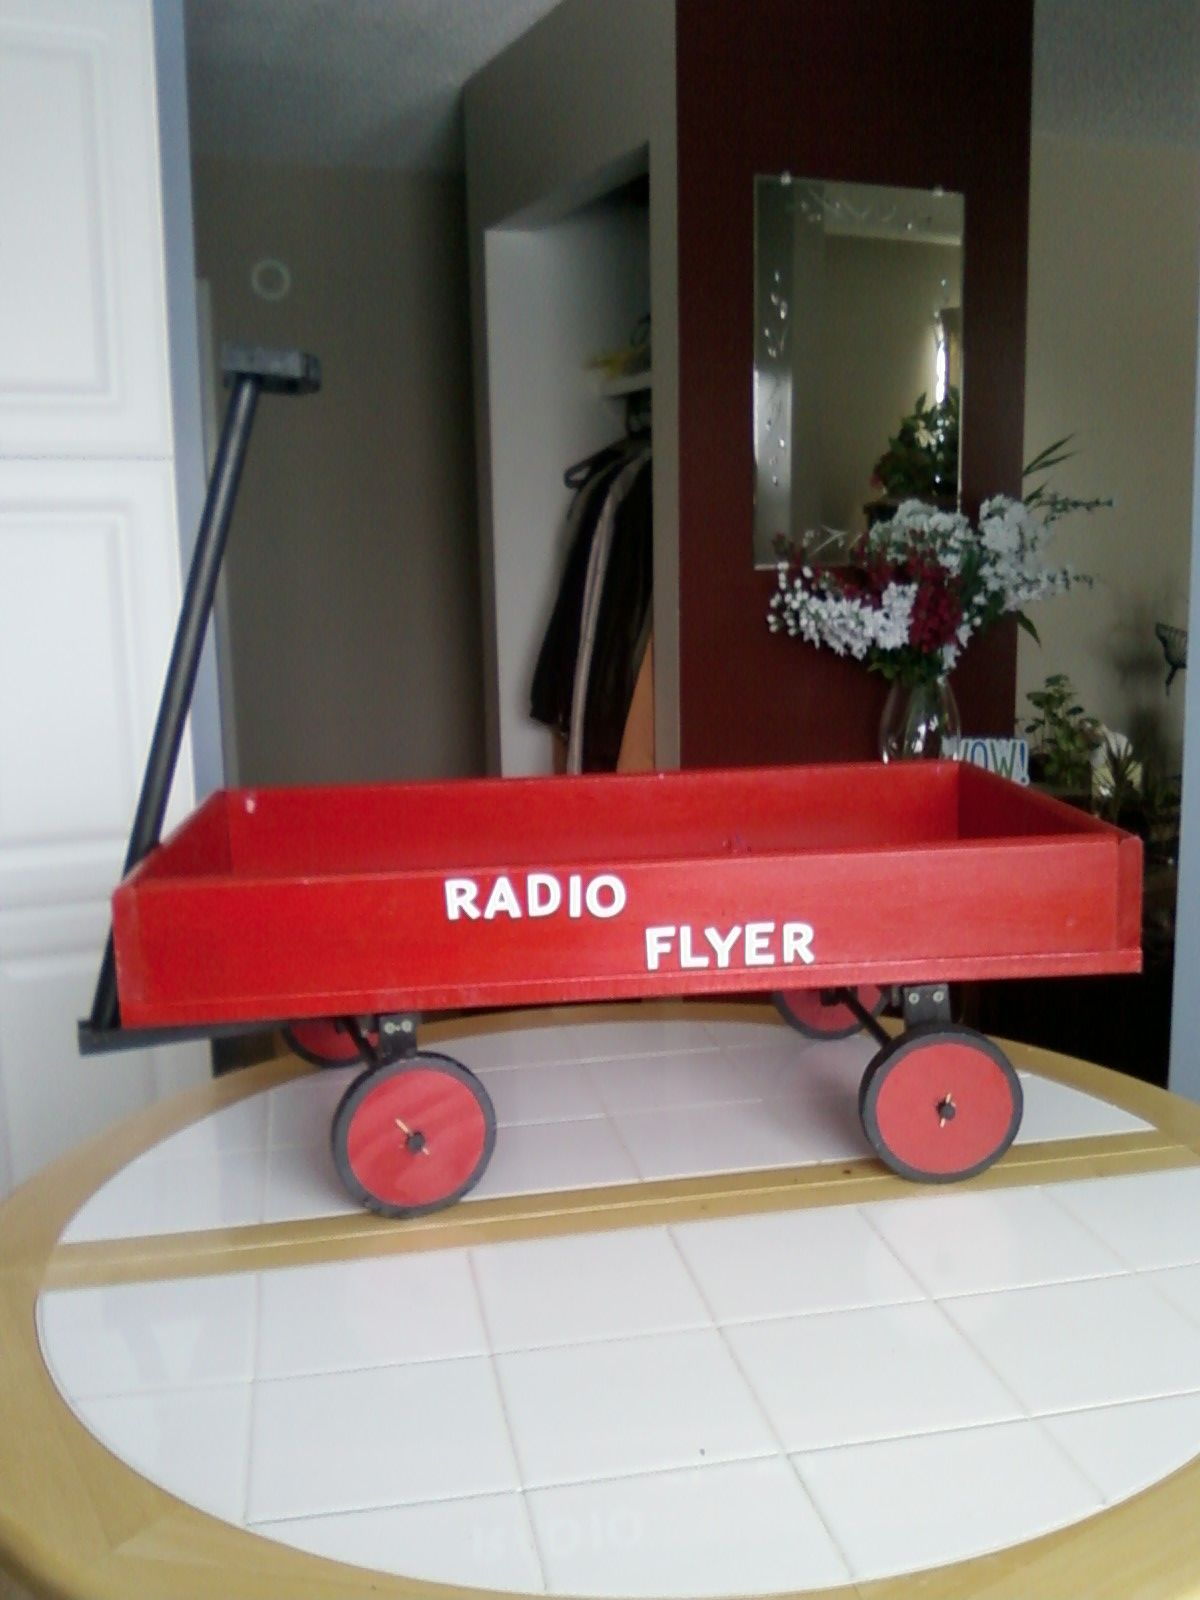 Home made Radio Flyer red wagon. Radio flyer, Red wagon